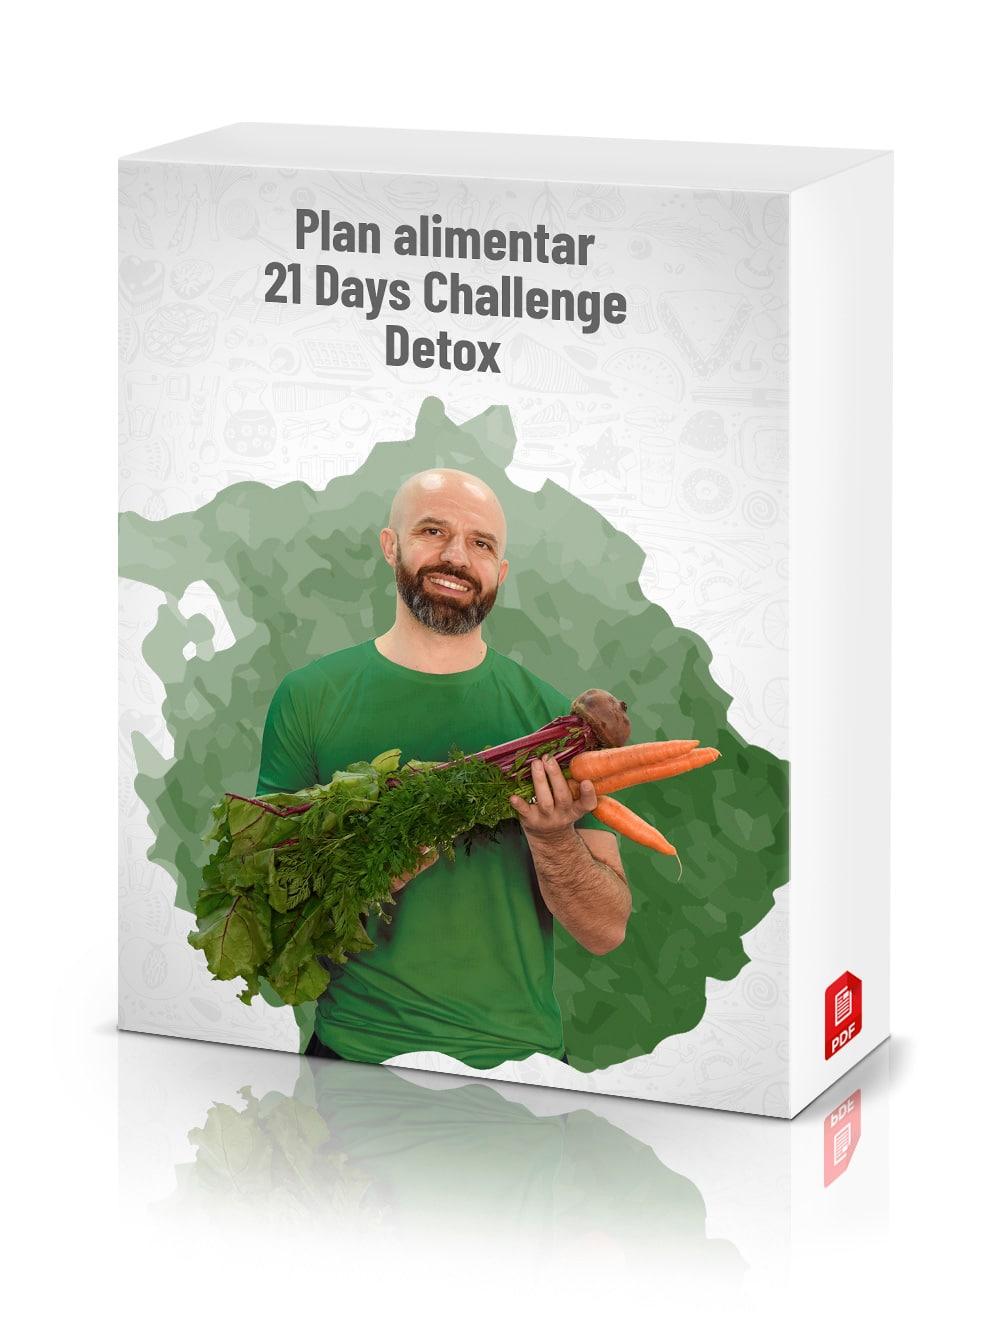 Plan alimentar 21 Days Challenge (DETOX)